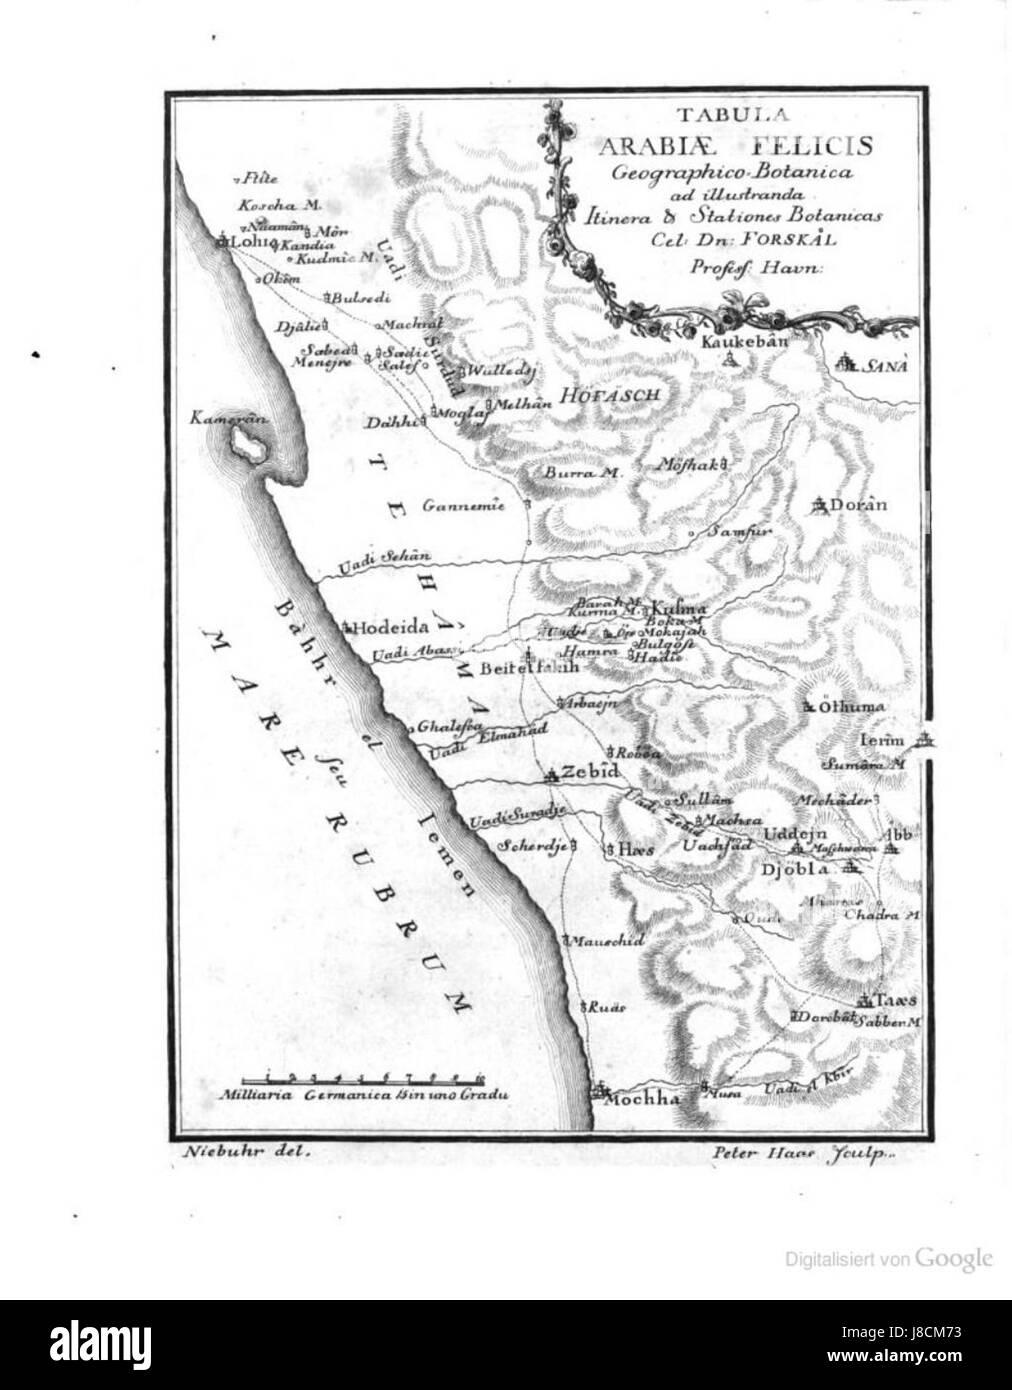 Map of yemen 1763 - Stock Image